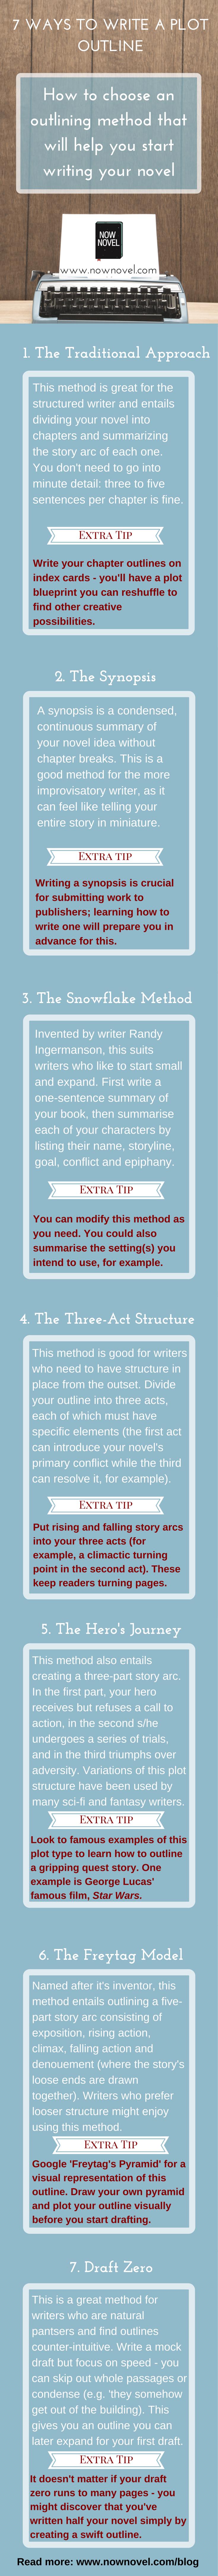 Plotoutlinefinalg   Creating An Ebook  Pinterest  Novels, Creative Writing And Books